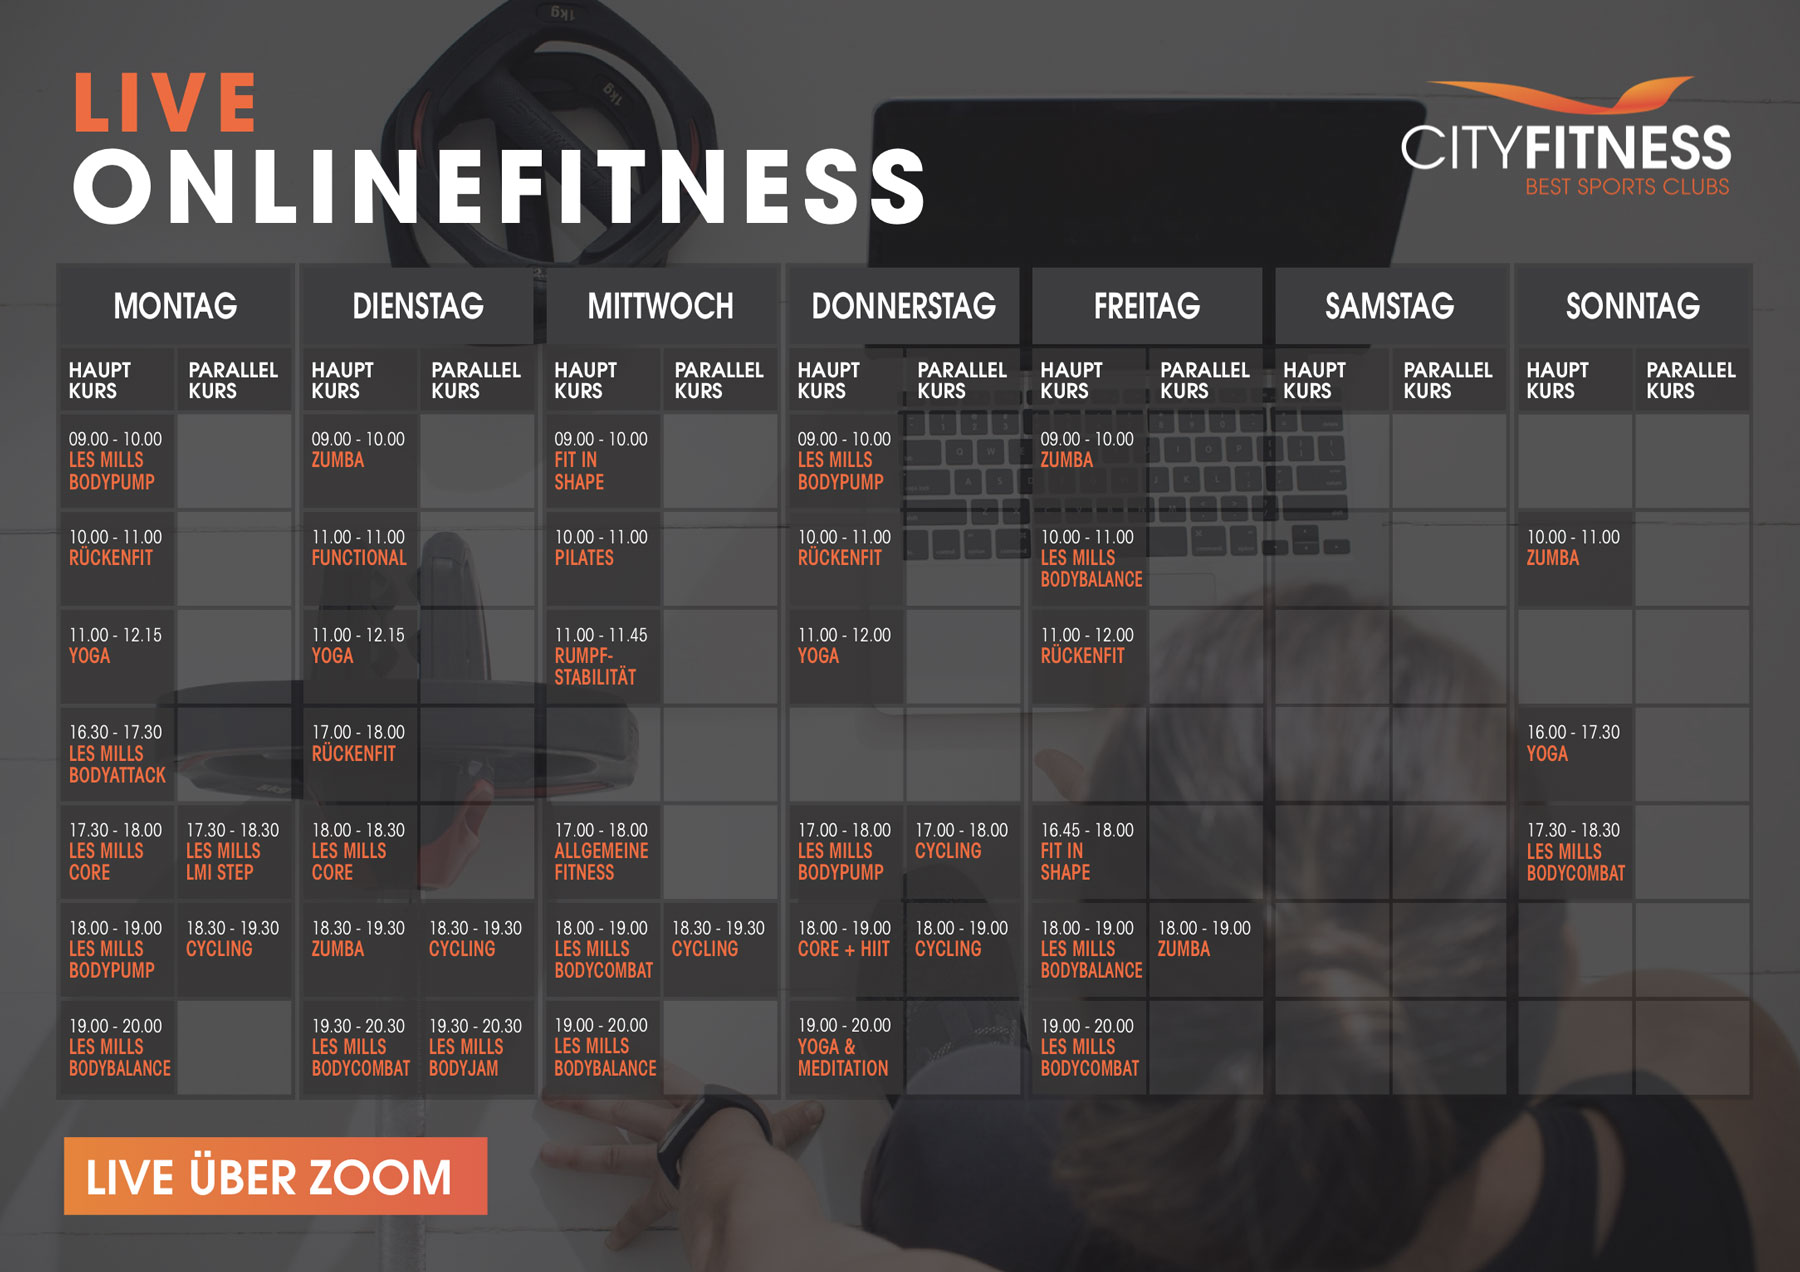 CITYFITNESS Onlinefitness